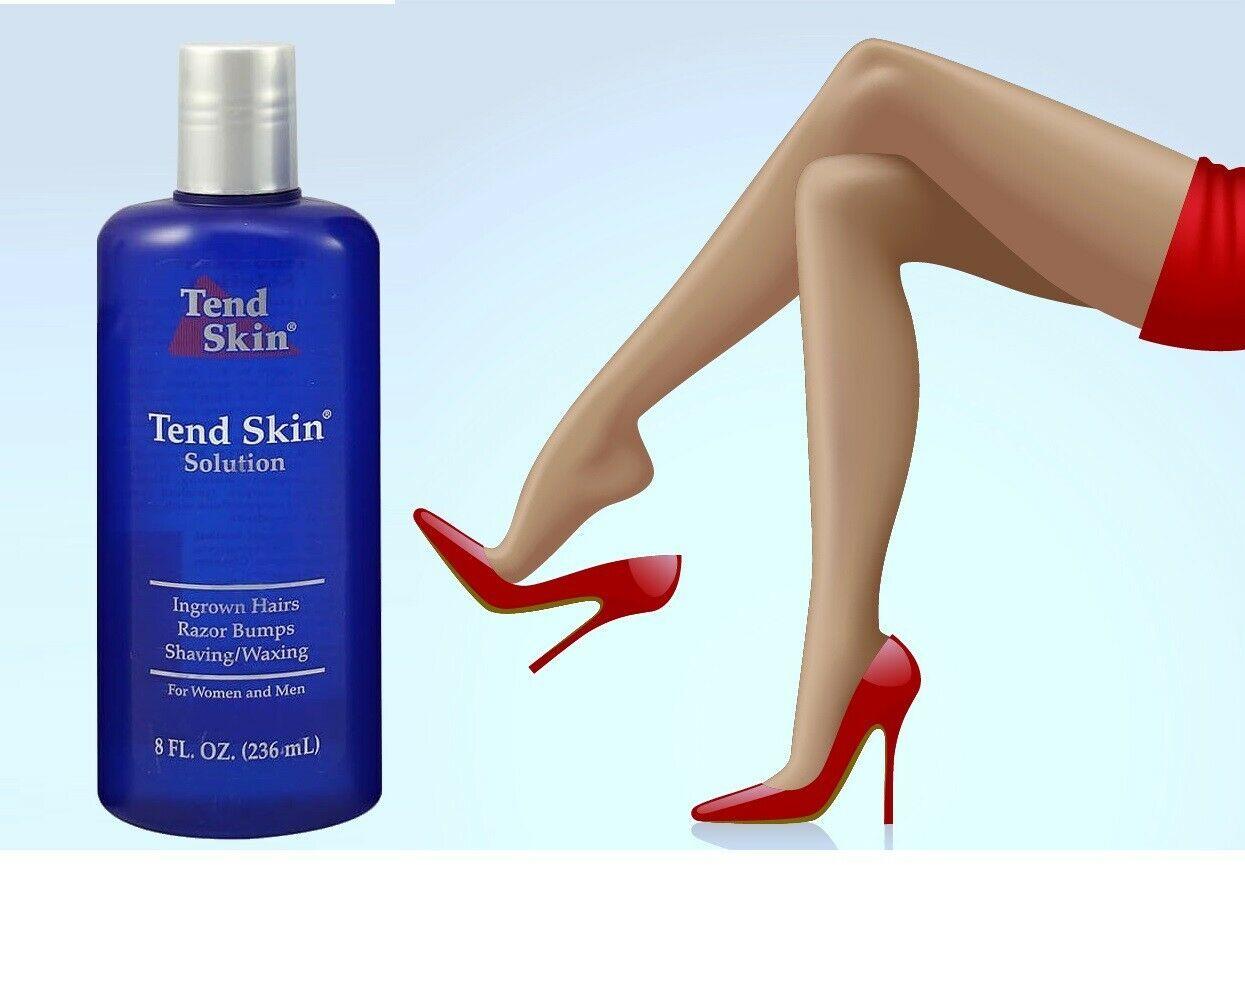 Tend Skin 8oz Solution Liquid Ingrown Hair Razor Bumps Burns Exp 12 2020 Ebay In 2020 Tend Skin Ingrown Hair Razor Bumps